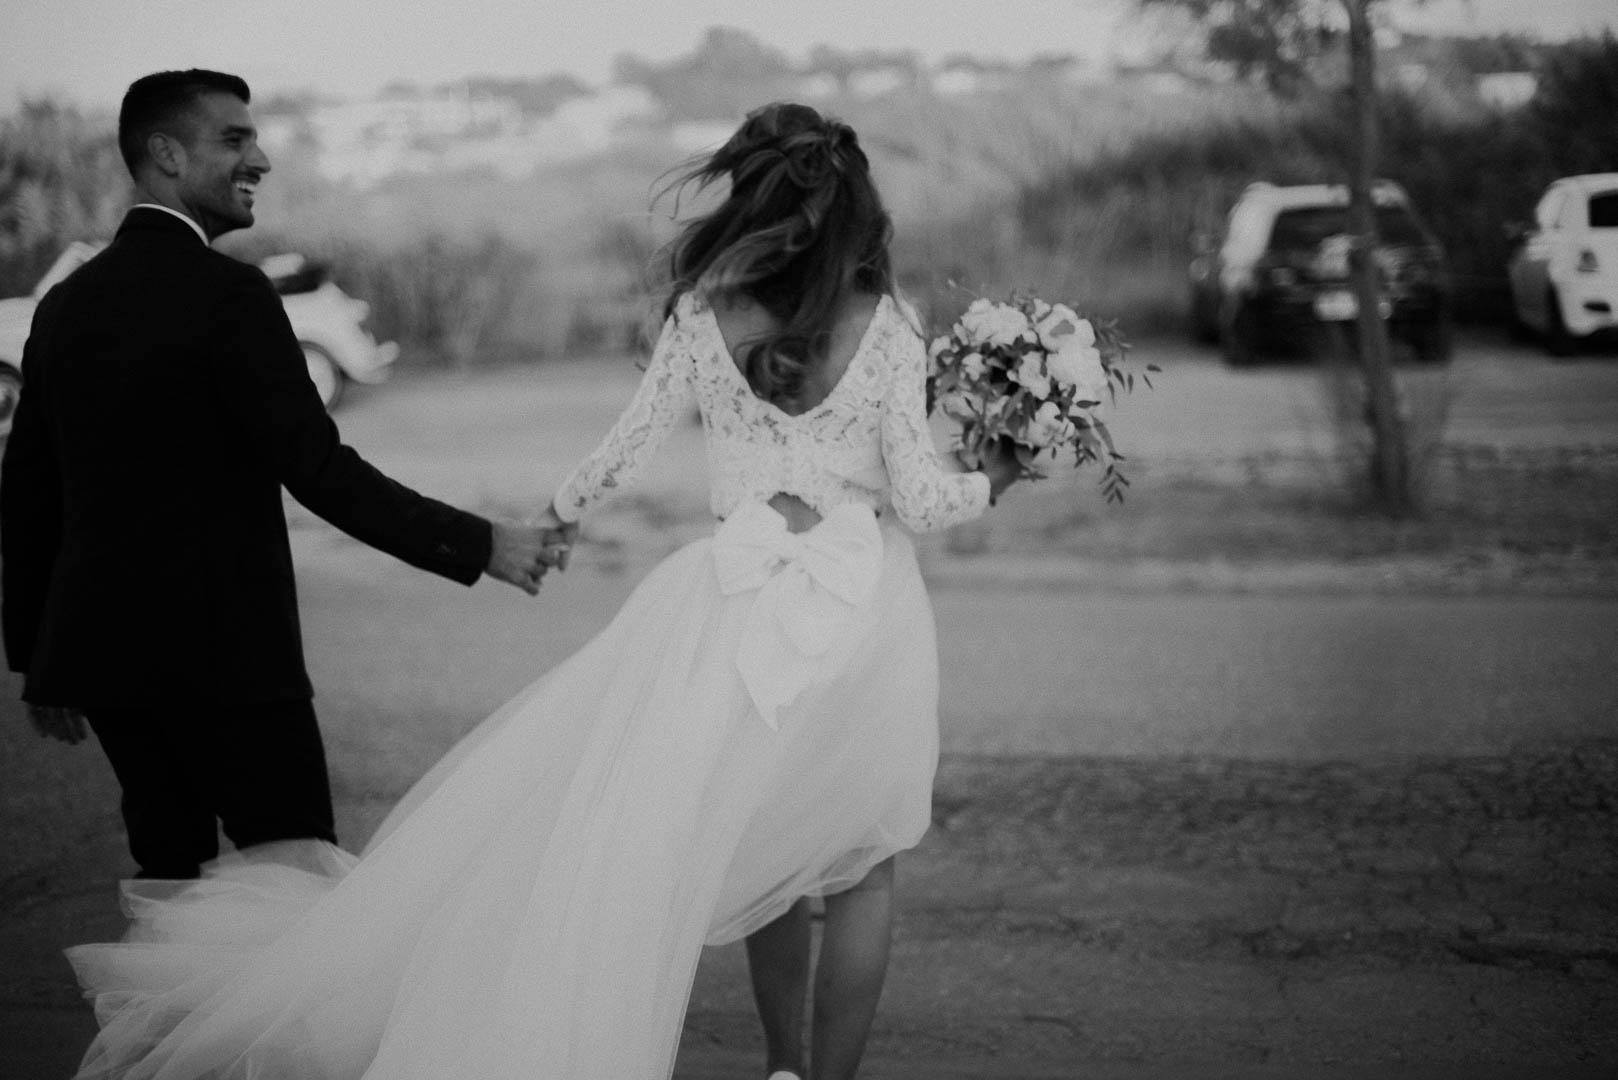 wedding-photographer-destination-fineart-bespoke-reportage-napoli-nabilah-vivianeizzo-spazio46-98